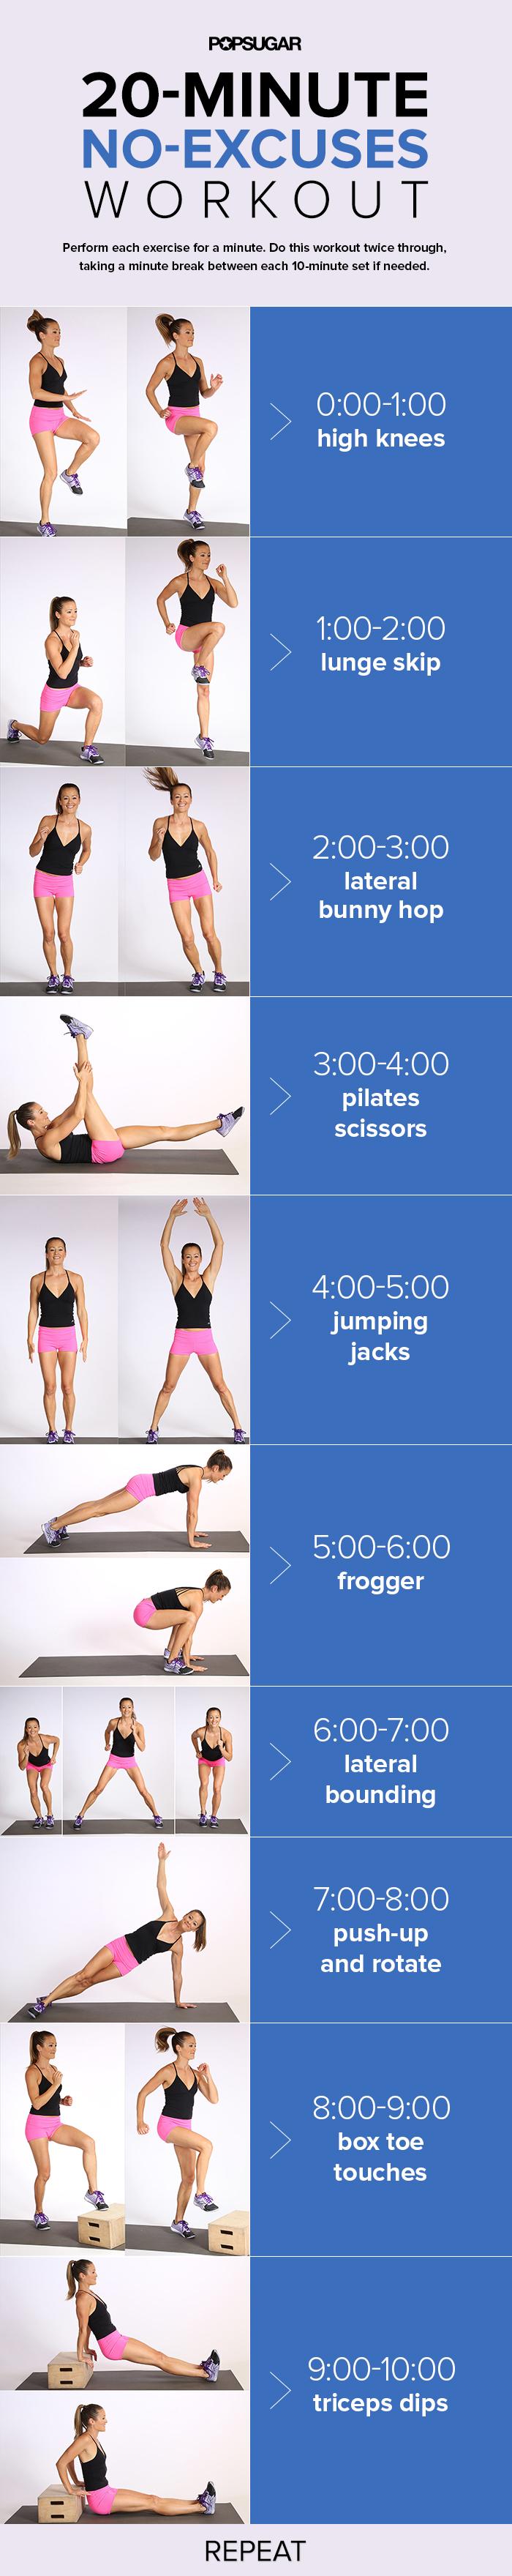 10 Minute No Floor Workout